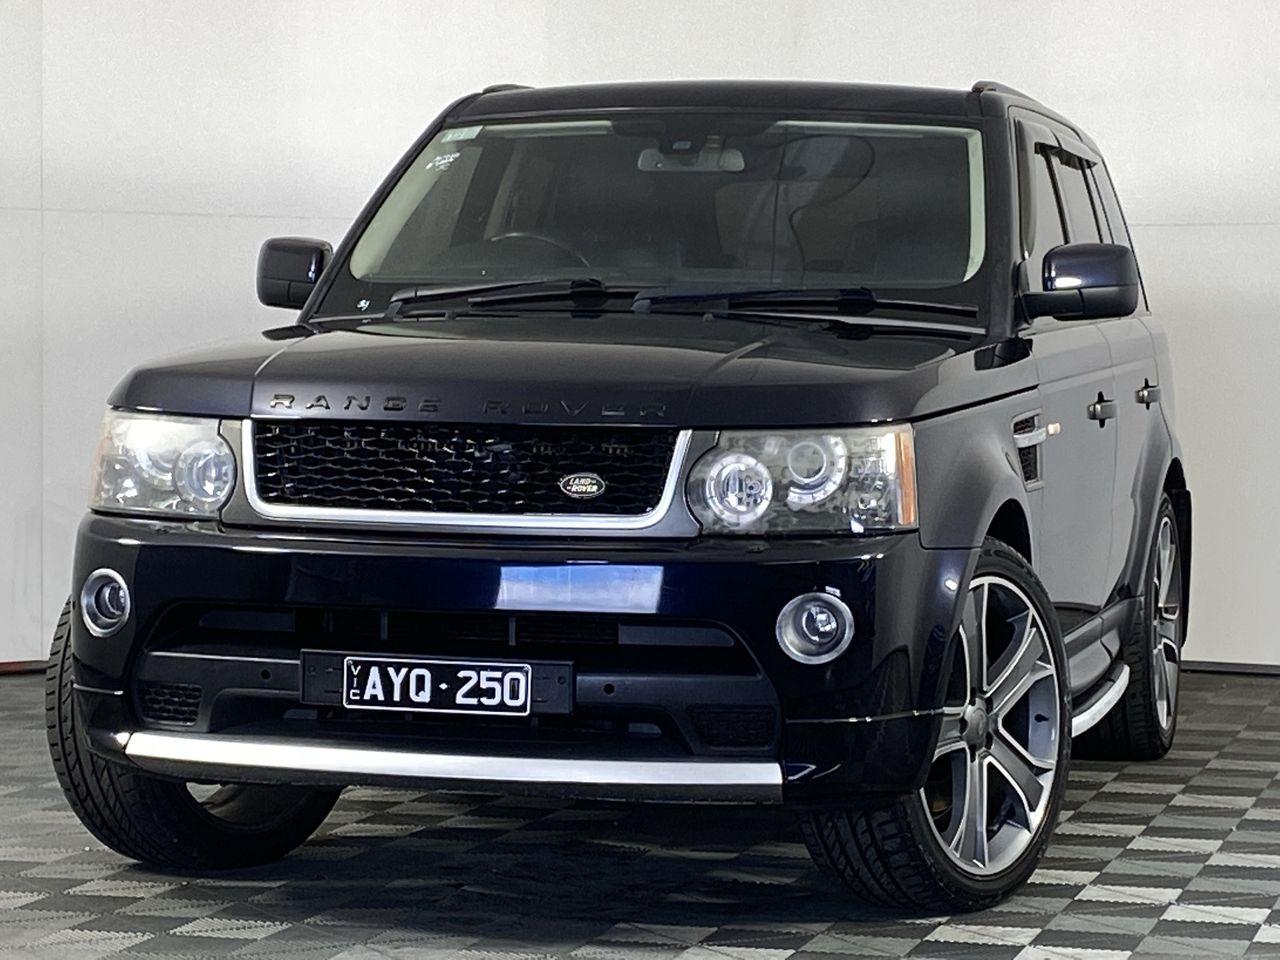 2009 Land Rover Range Rover Sport 3.0 TDV6 Turbo Diesel Automatic Wagon